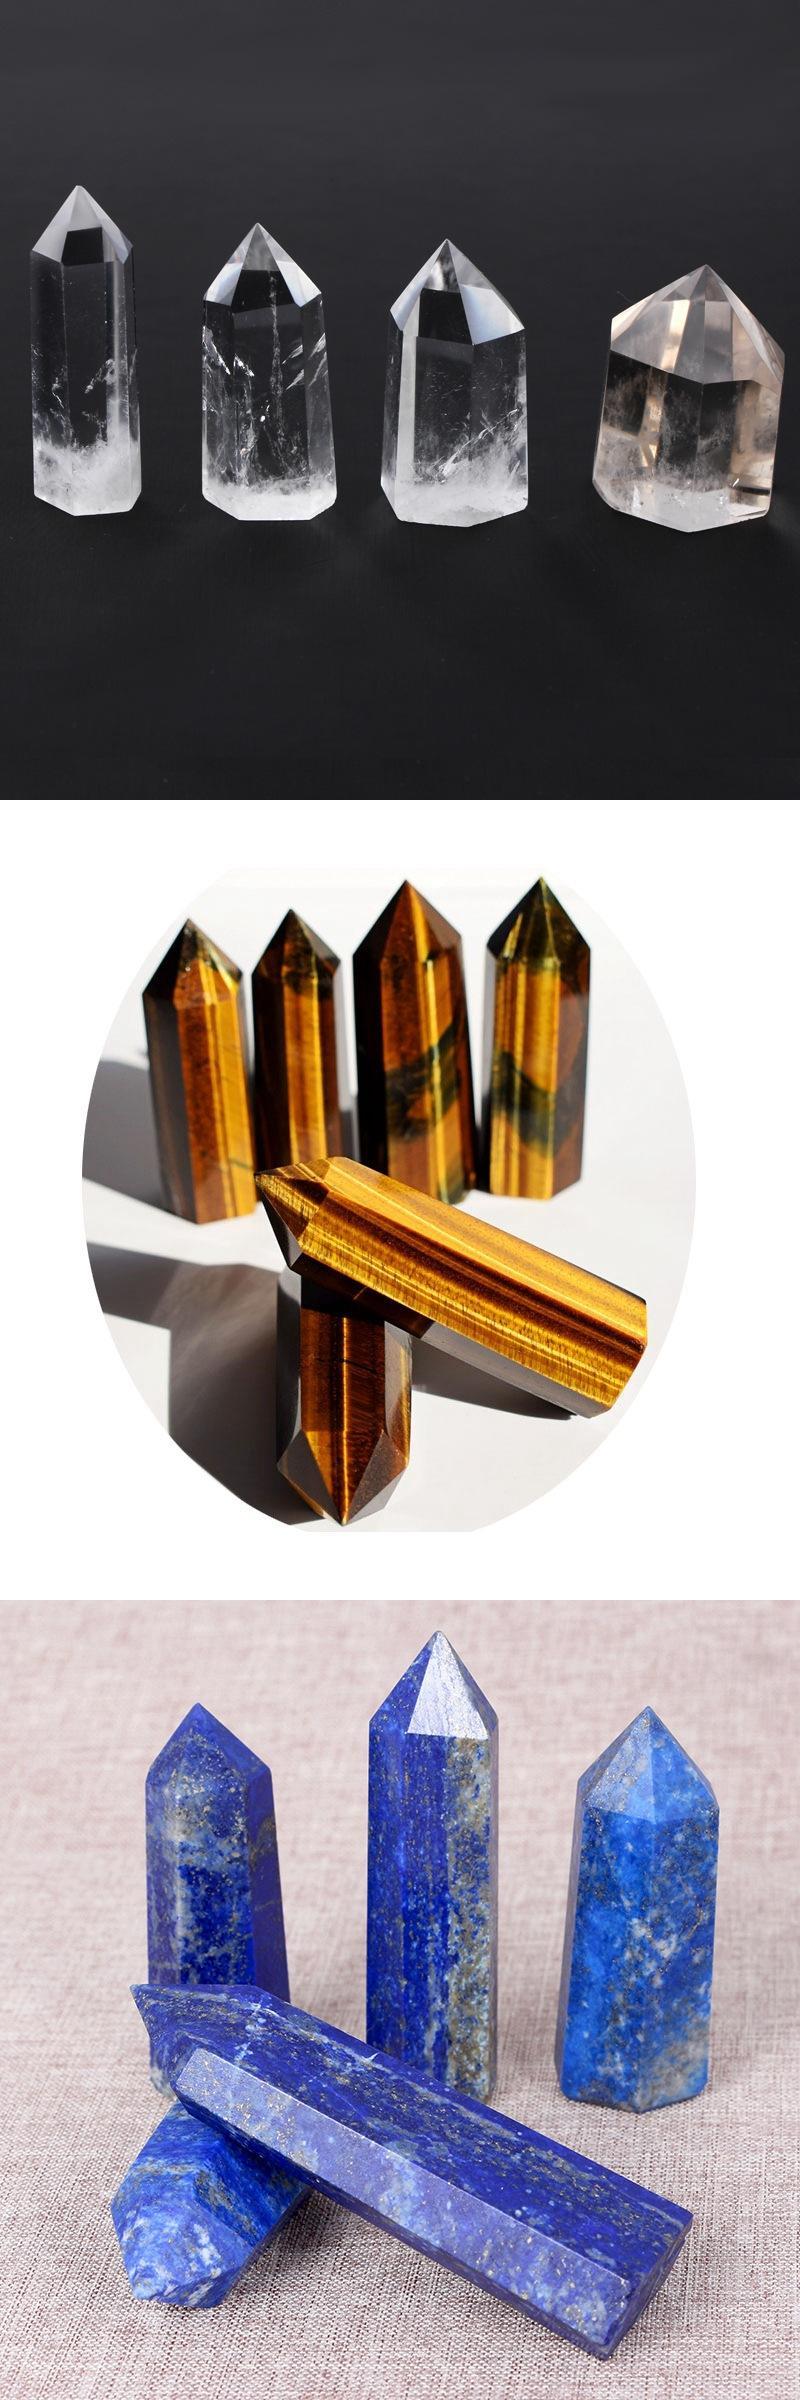 Rare Natural Amethyst Quartz Reiki Gemstone Healing Wands Fluorite Crystal Points